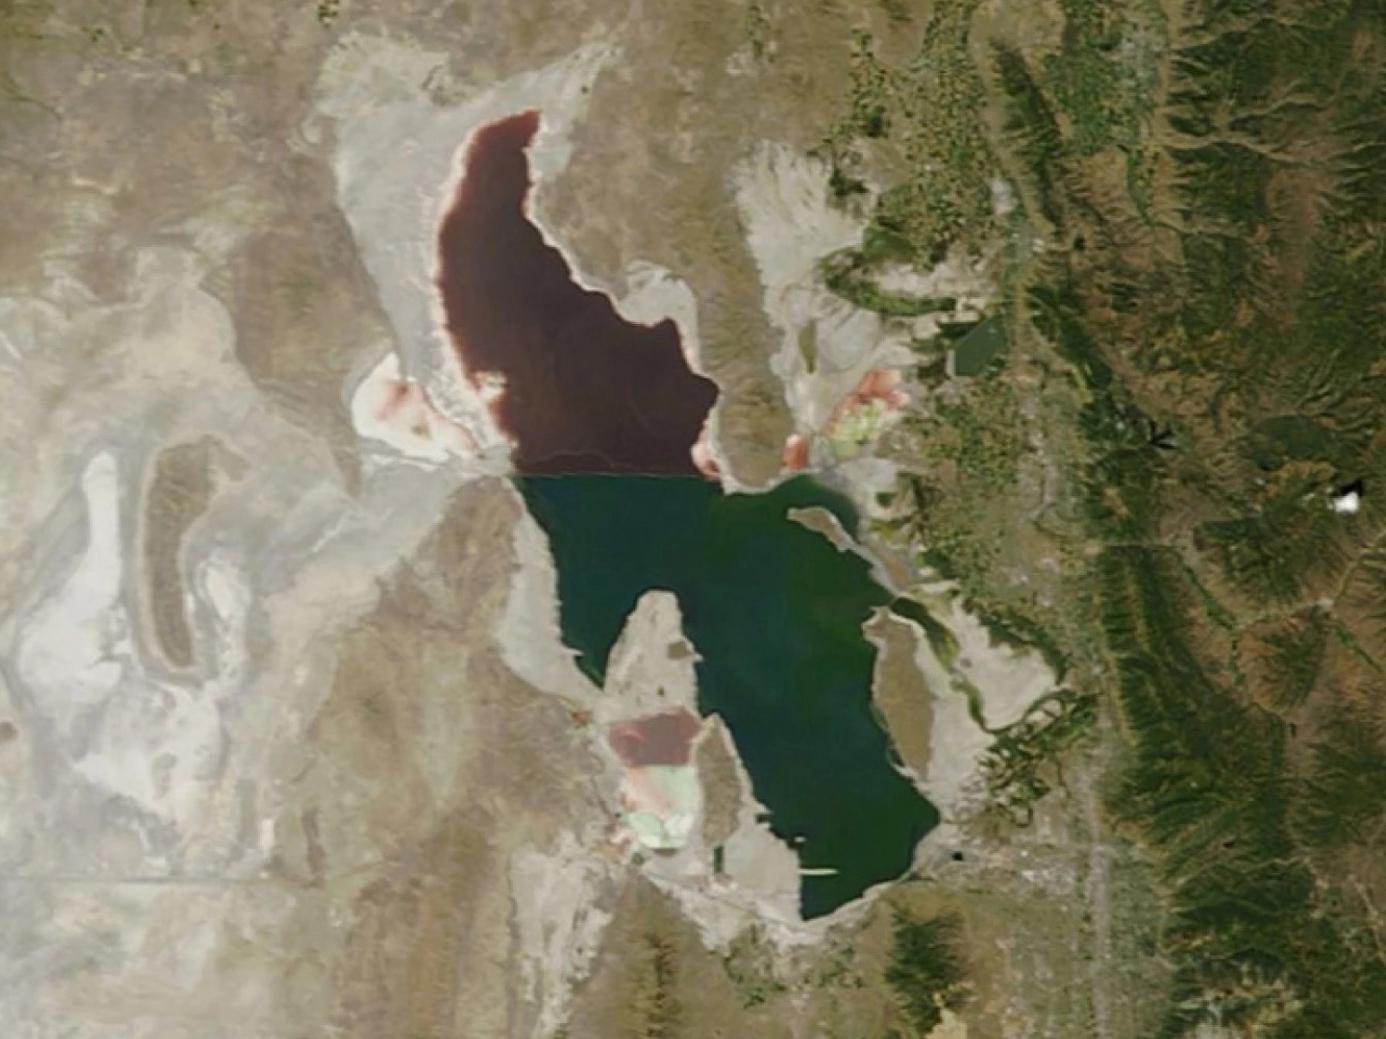 Dry lake city great salt lake is shrinking nasa satellite image of utahs great salt lake 18 aug 2014 publicscrutiny Images